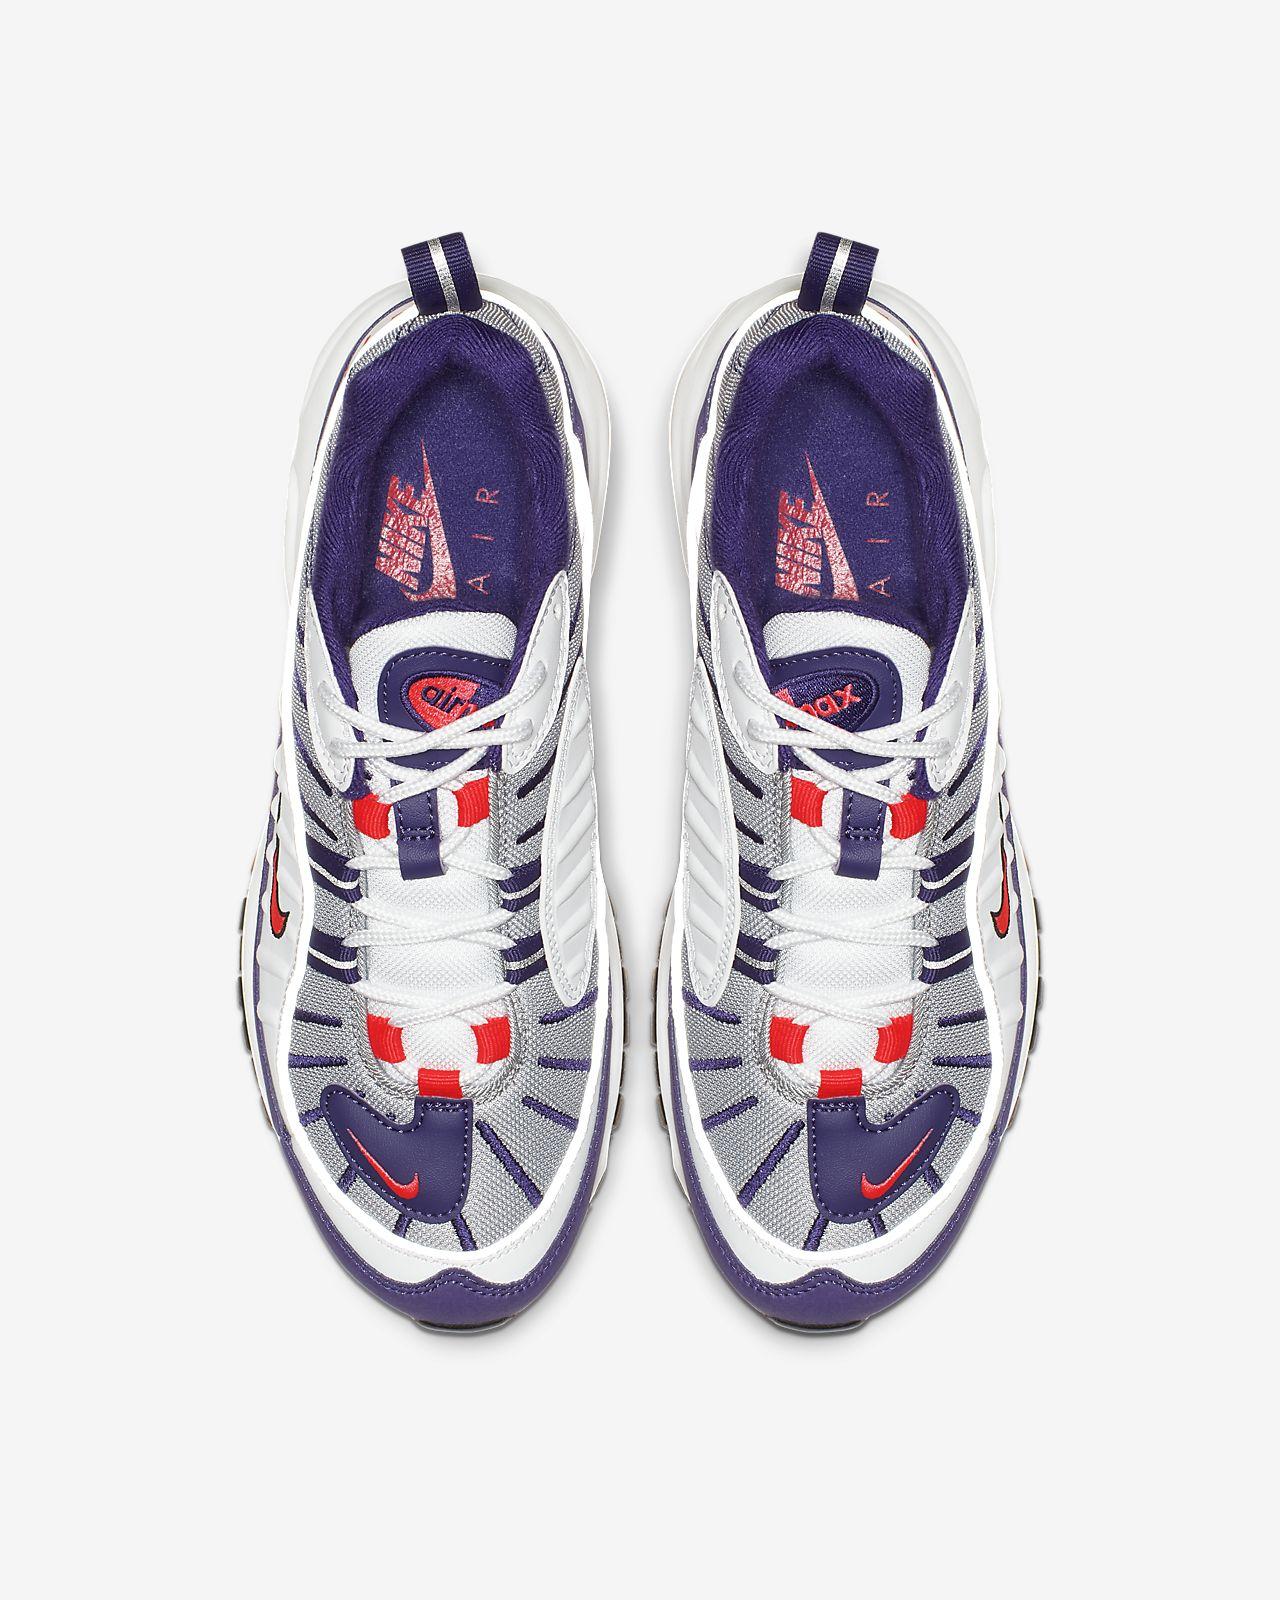 best service 9d86c 9b4d3 ... Nike Air Max 98 Womens Shoe